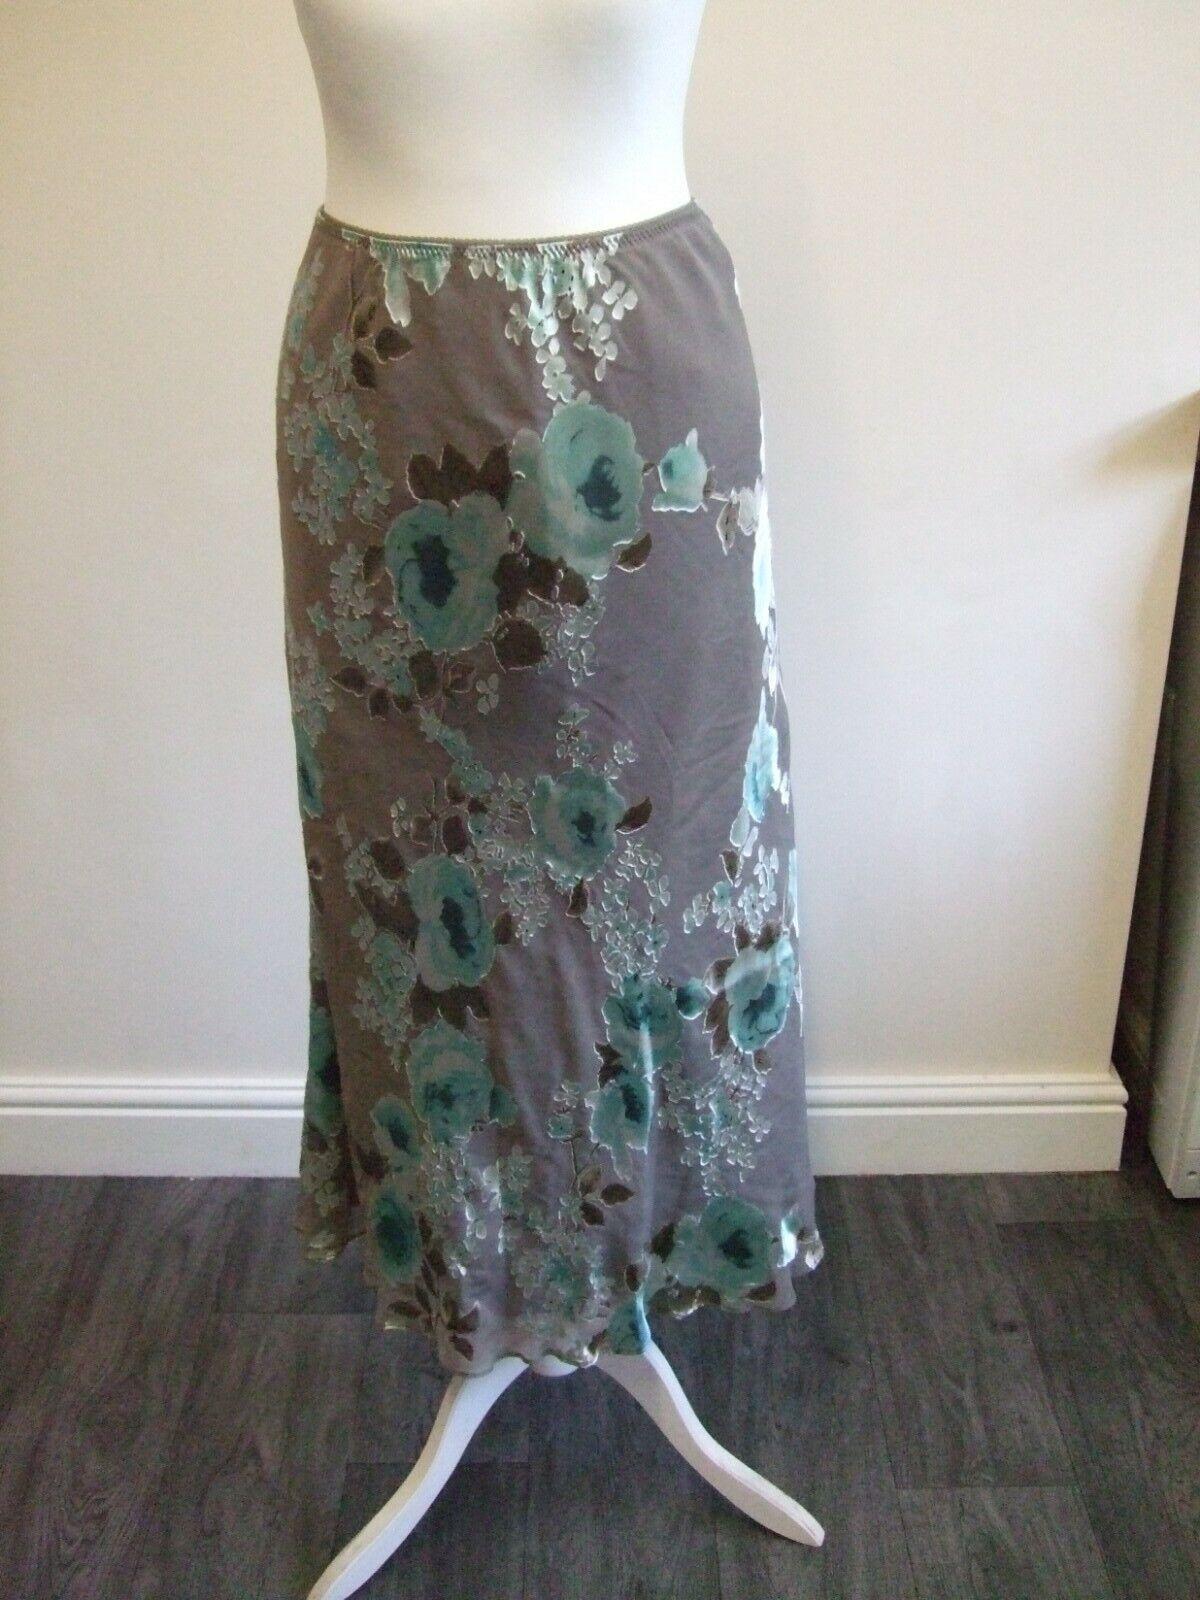 JACQUES VERT LADIES SKIRT size12 grey/blue print silk blend fabric